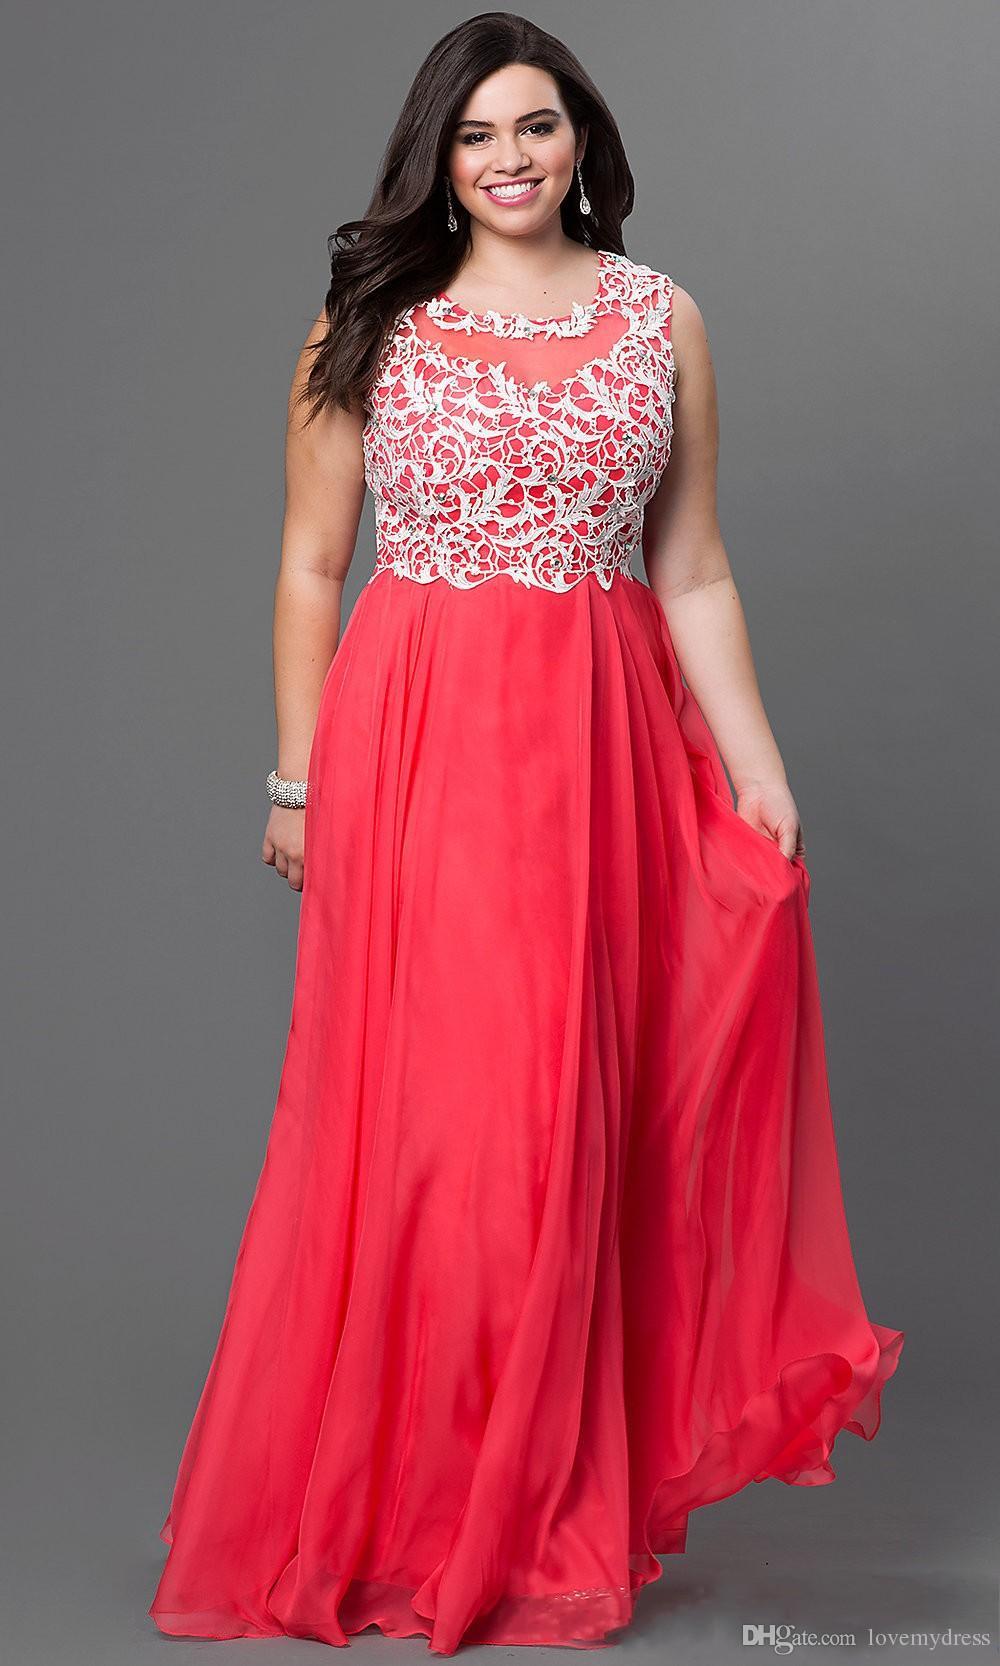 Neck Red Evening Dress Celebrite Sleeveless Long Prom Dress Cheap